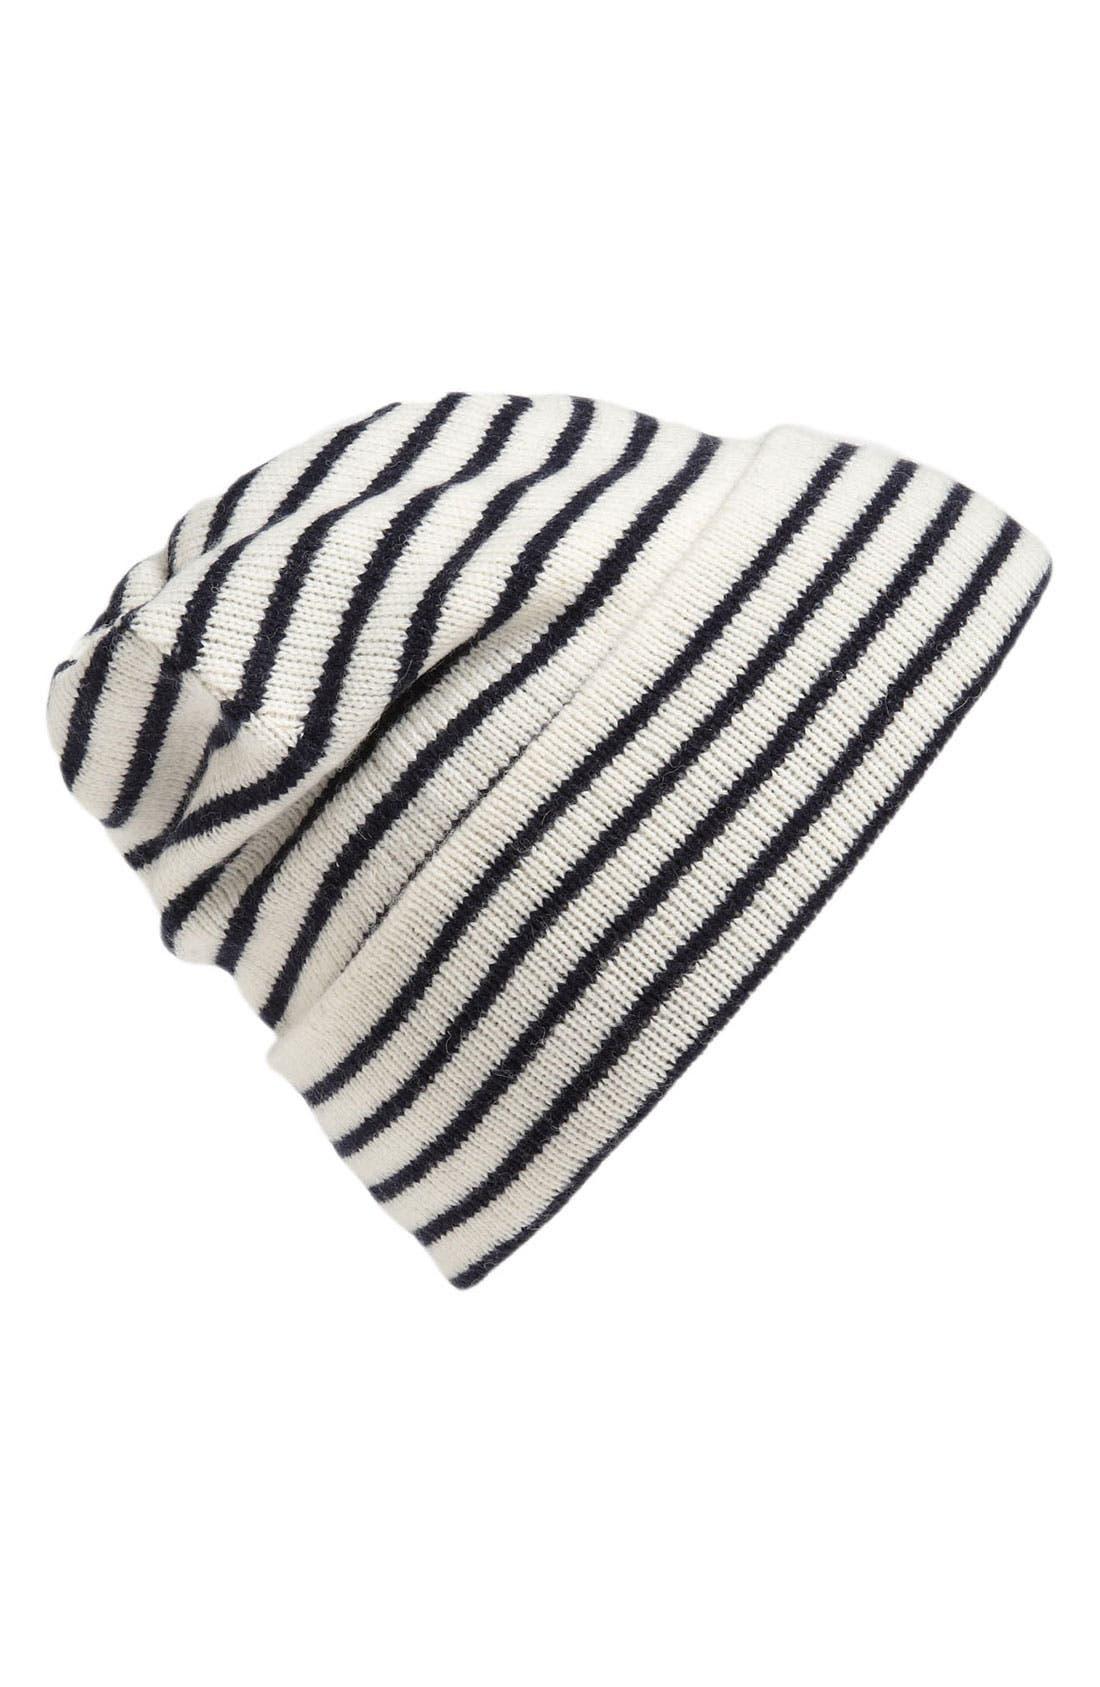 Main Image - Jack Spade 'Cooper' Stripe Hat